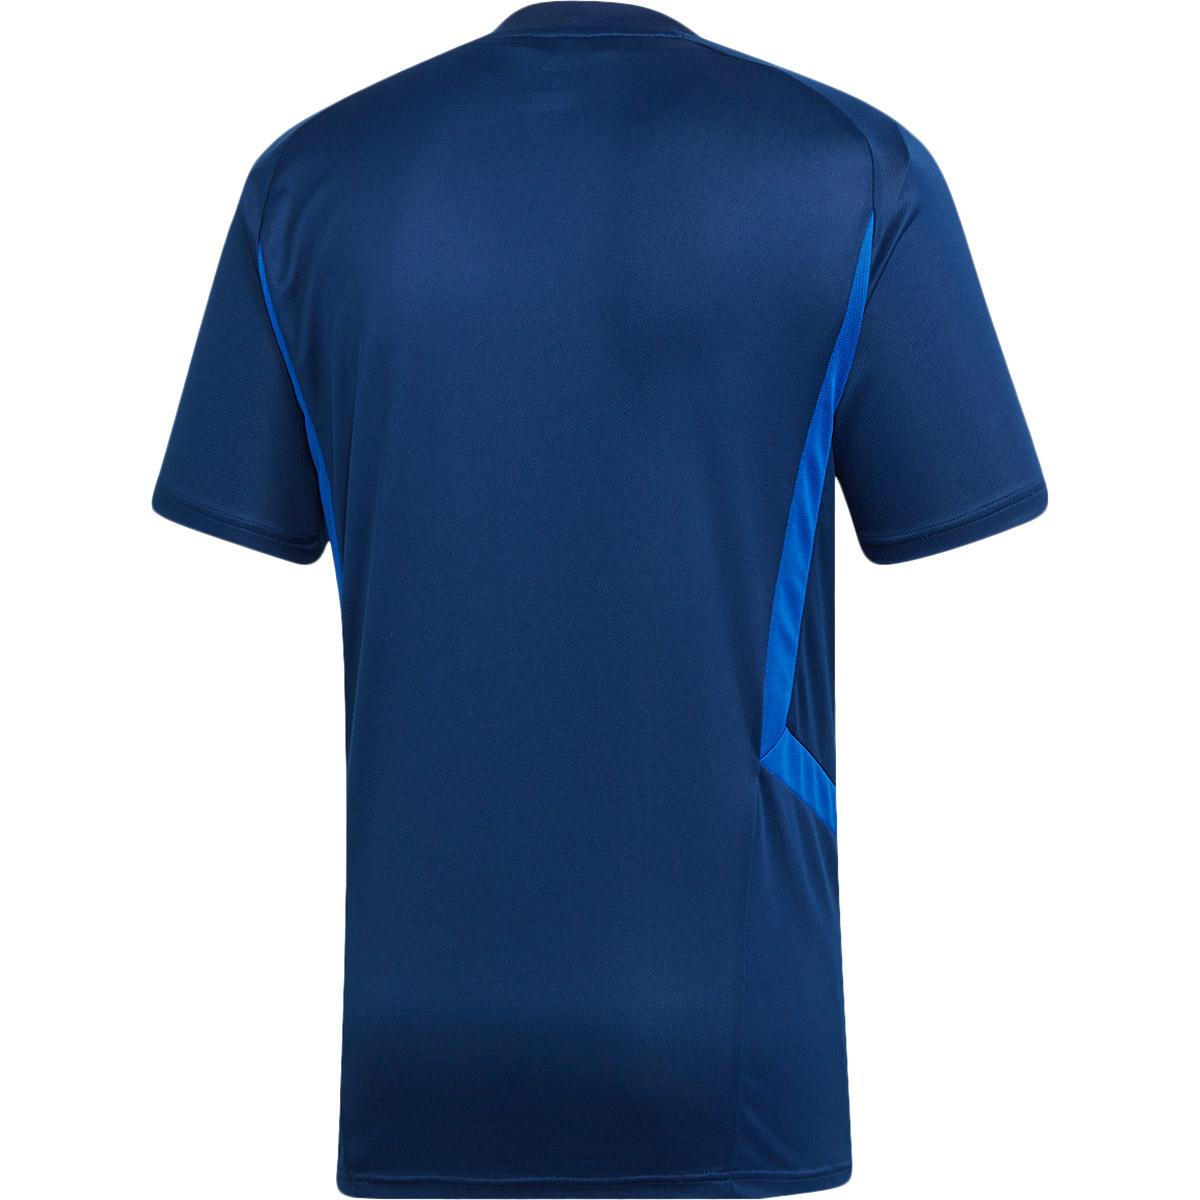 adidas Tiro 19 Trænings T-shirt Herre